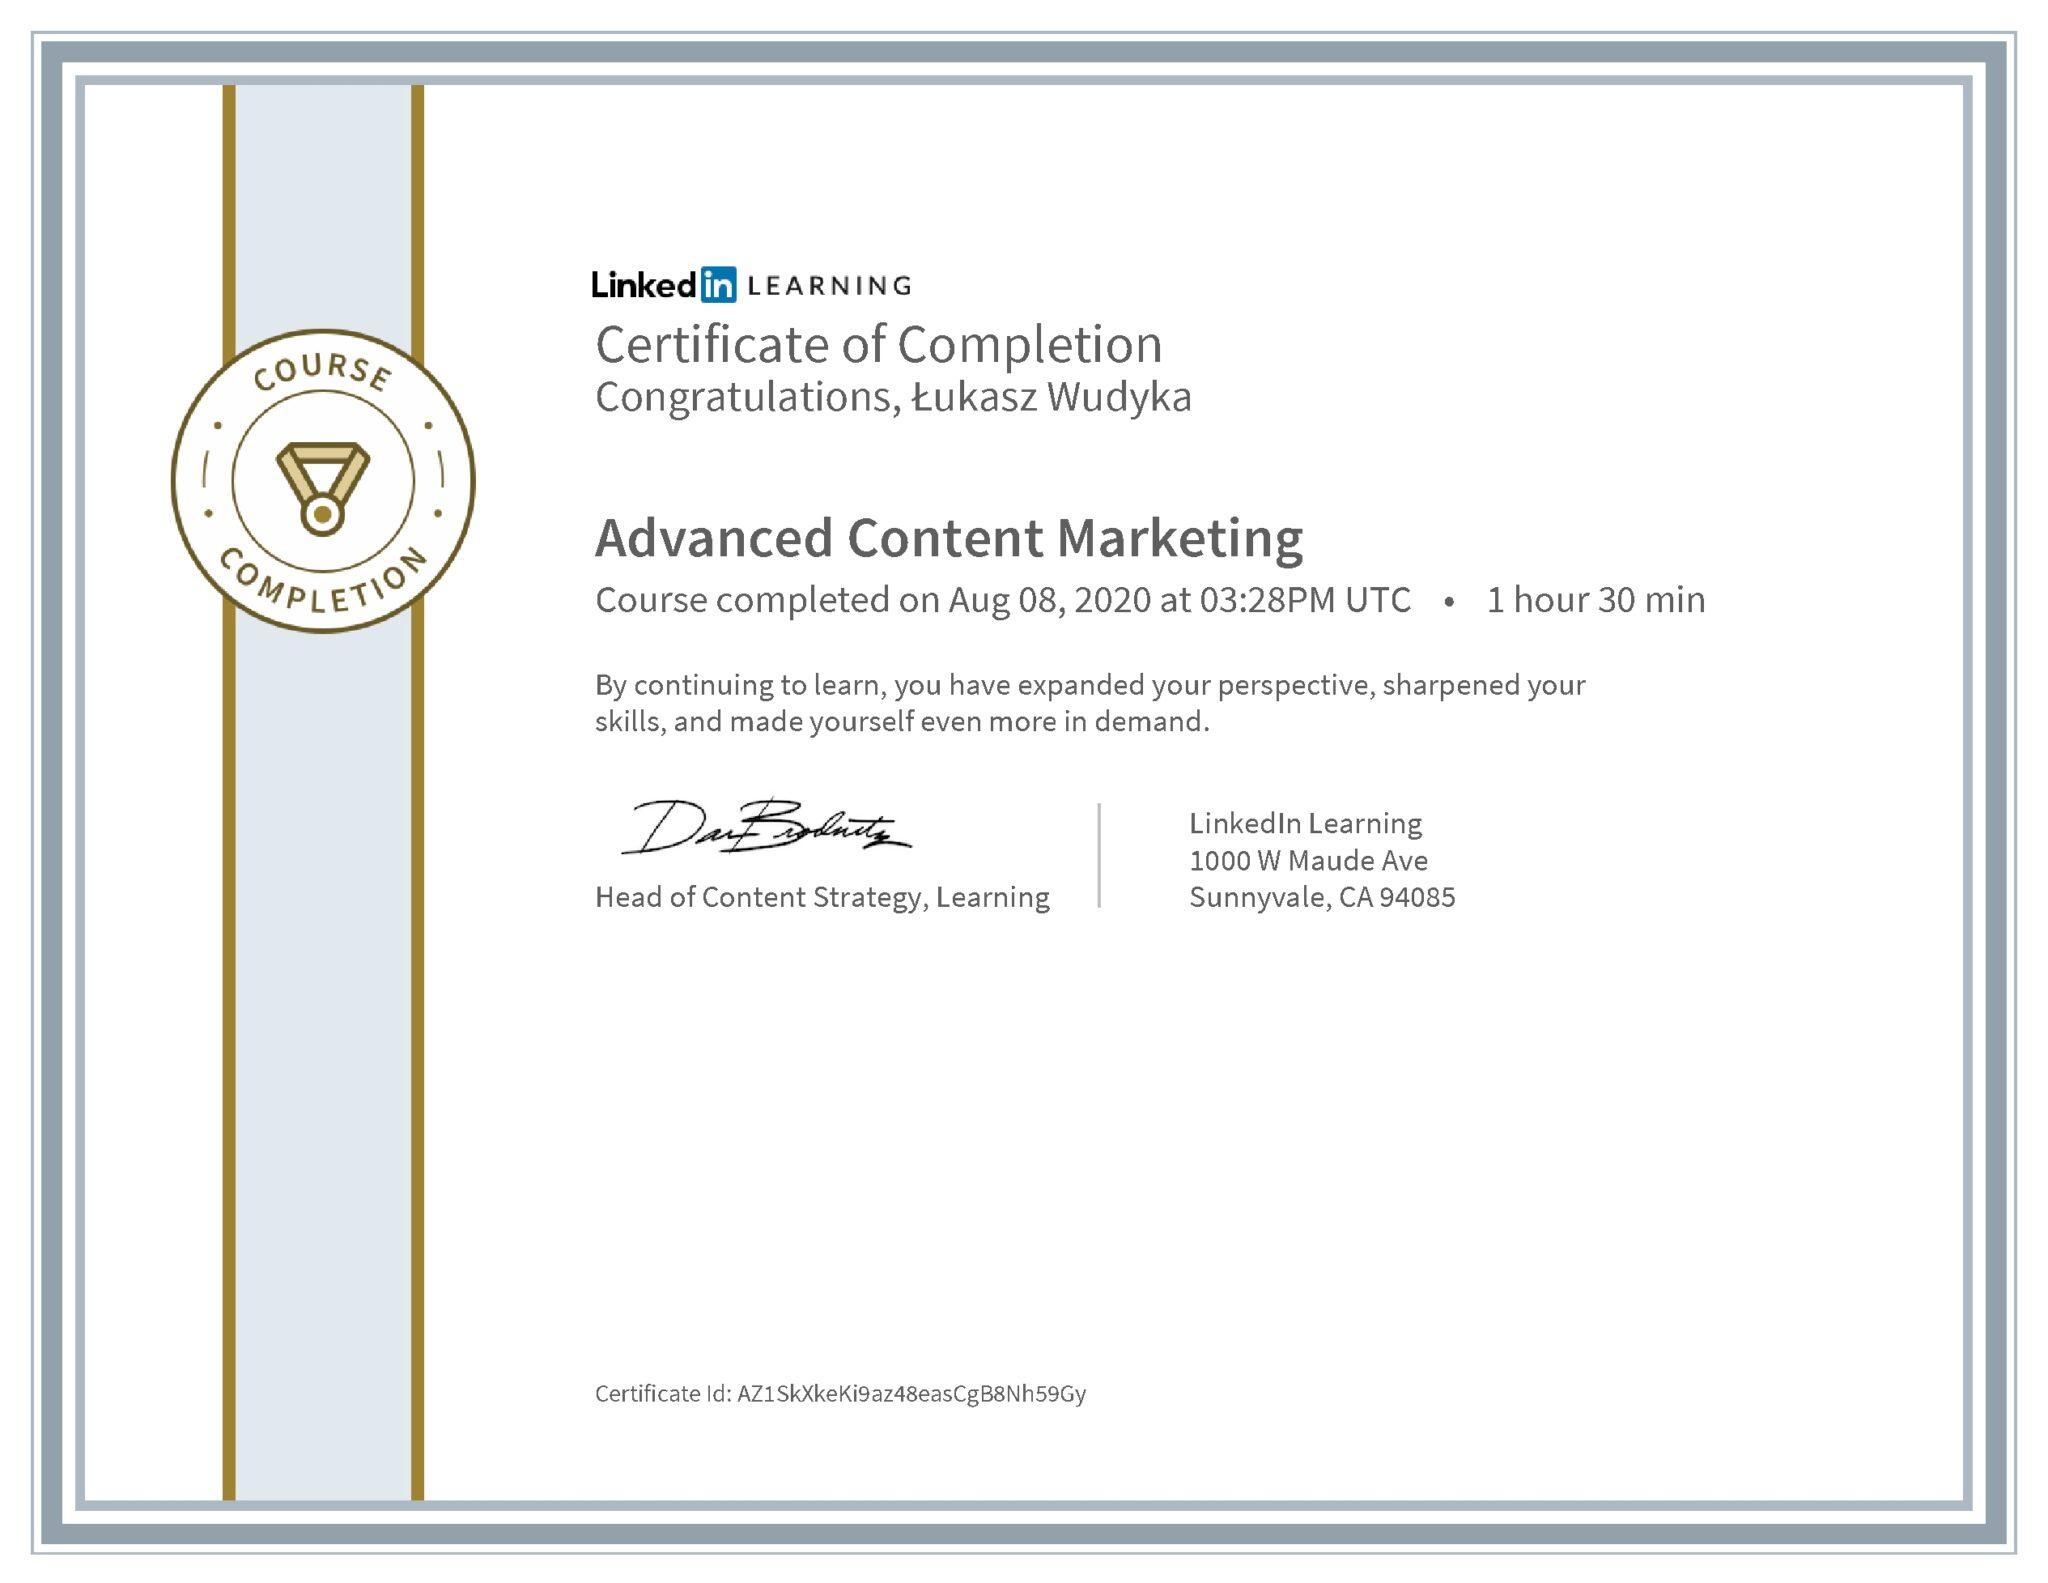 Łukasz Wudyka certyfikat LinkedIn Advanced Content Marketing